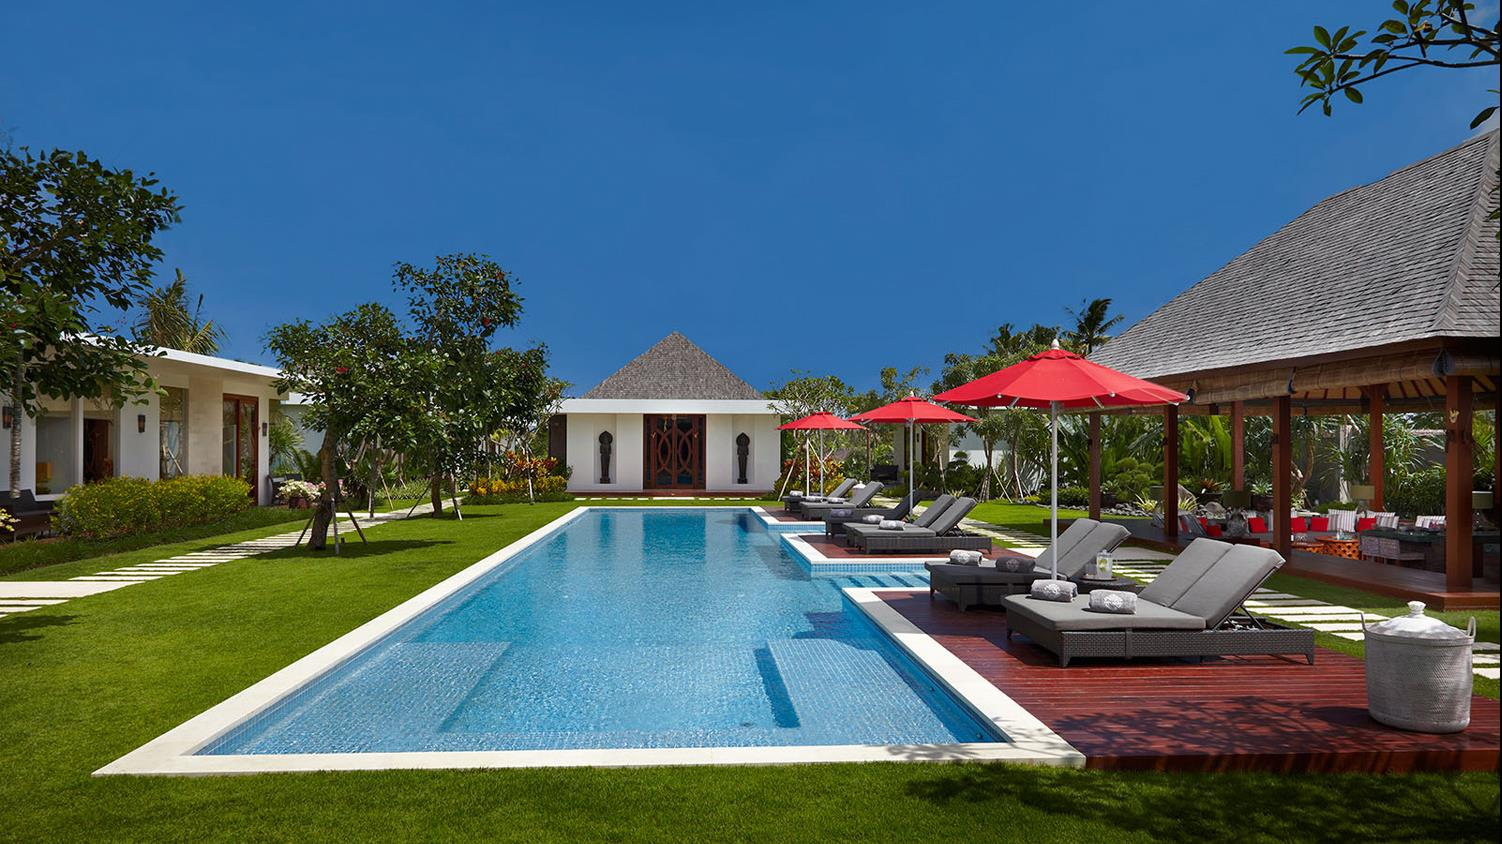 Private Pool - Villa Malaathina - Umalas, Bali